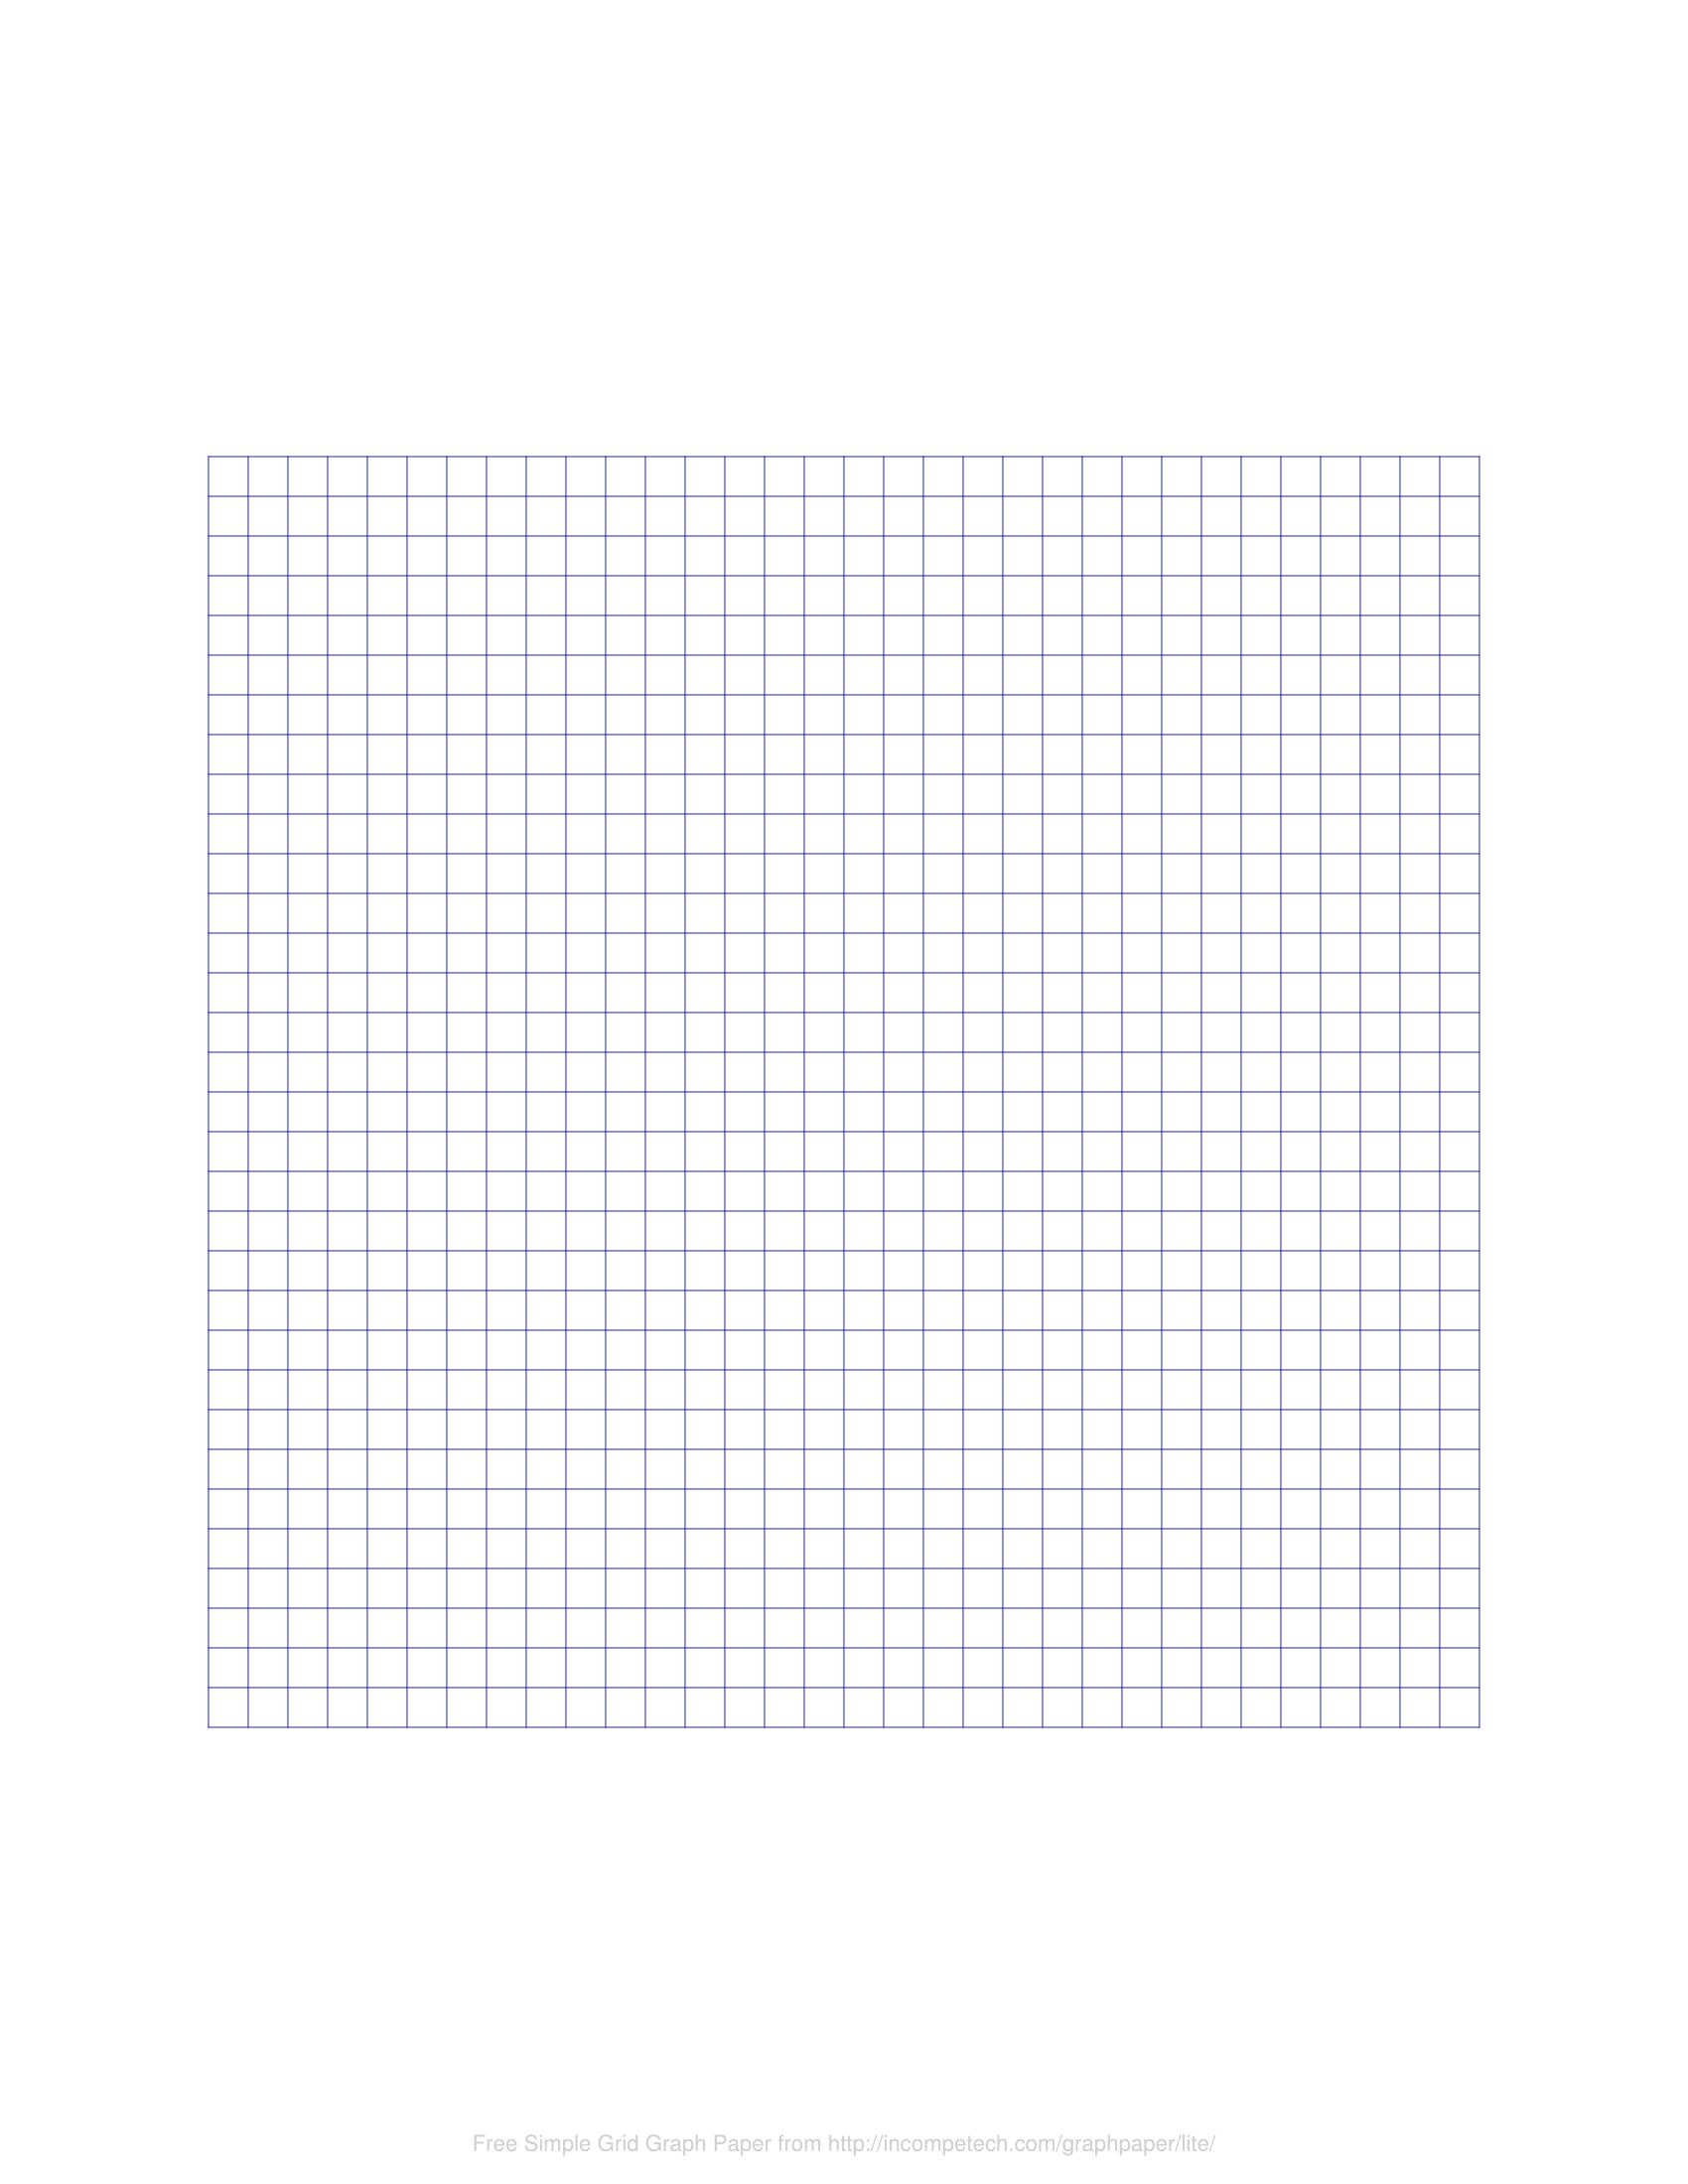 Free Online Graph Paper / Simple Grid - Cm Graph Paper Free Printable